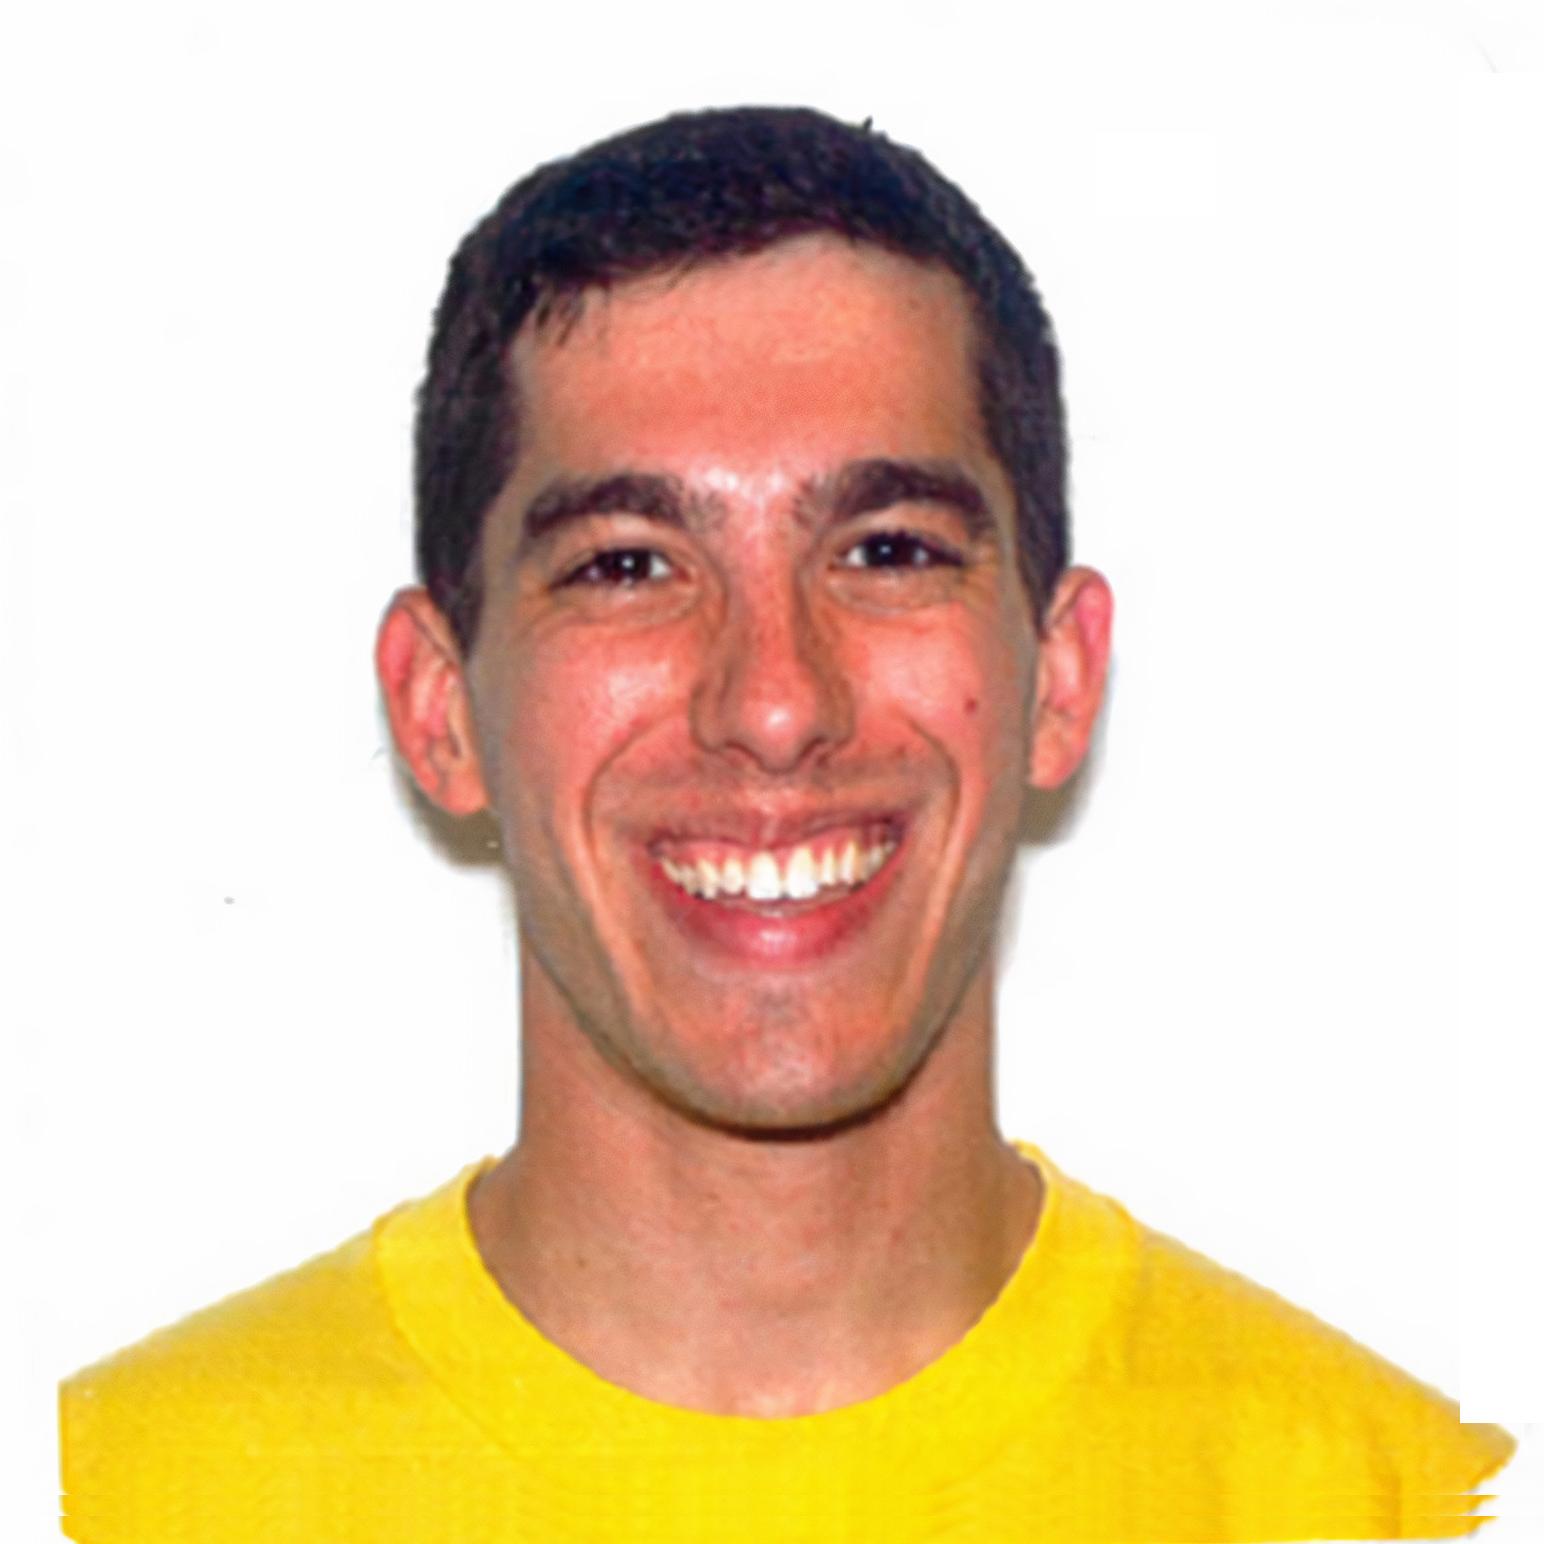 Adam Reinherz